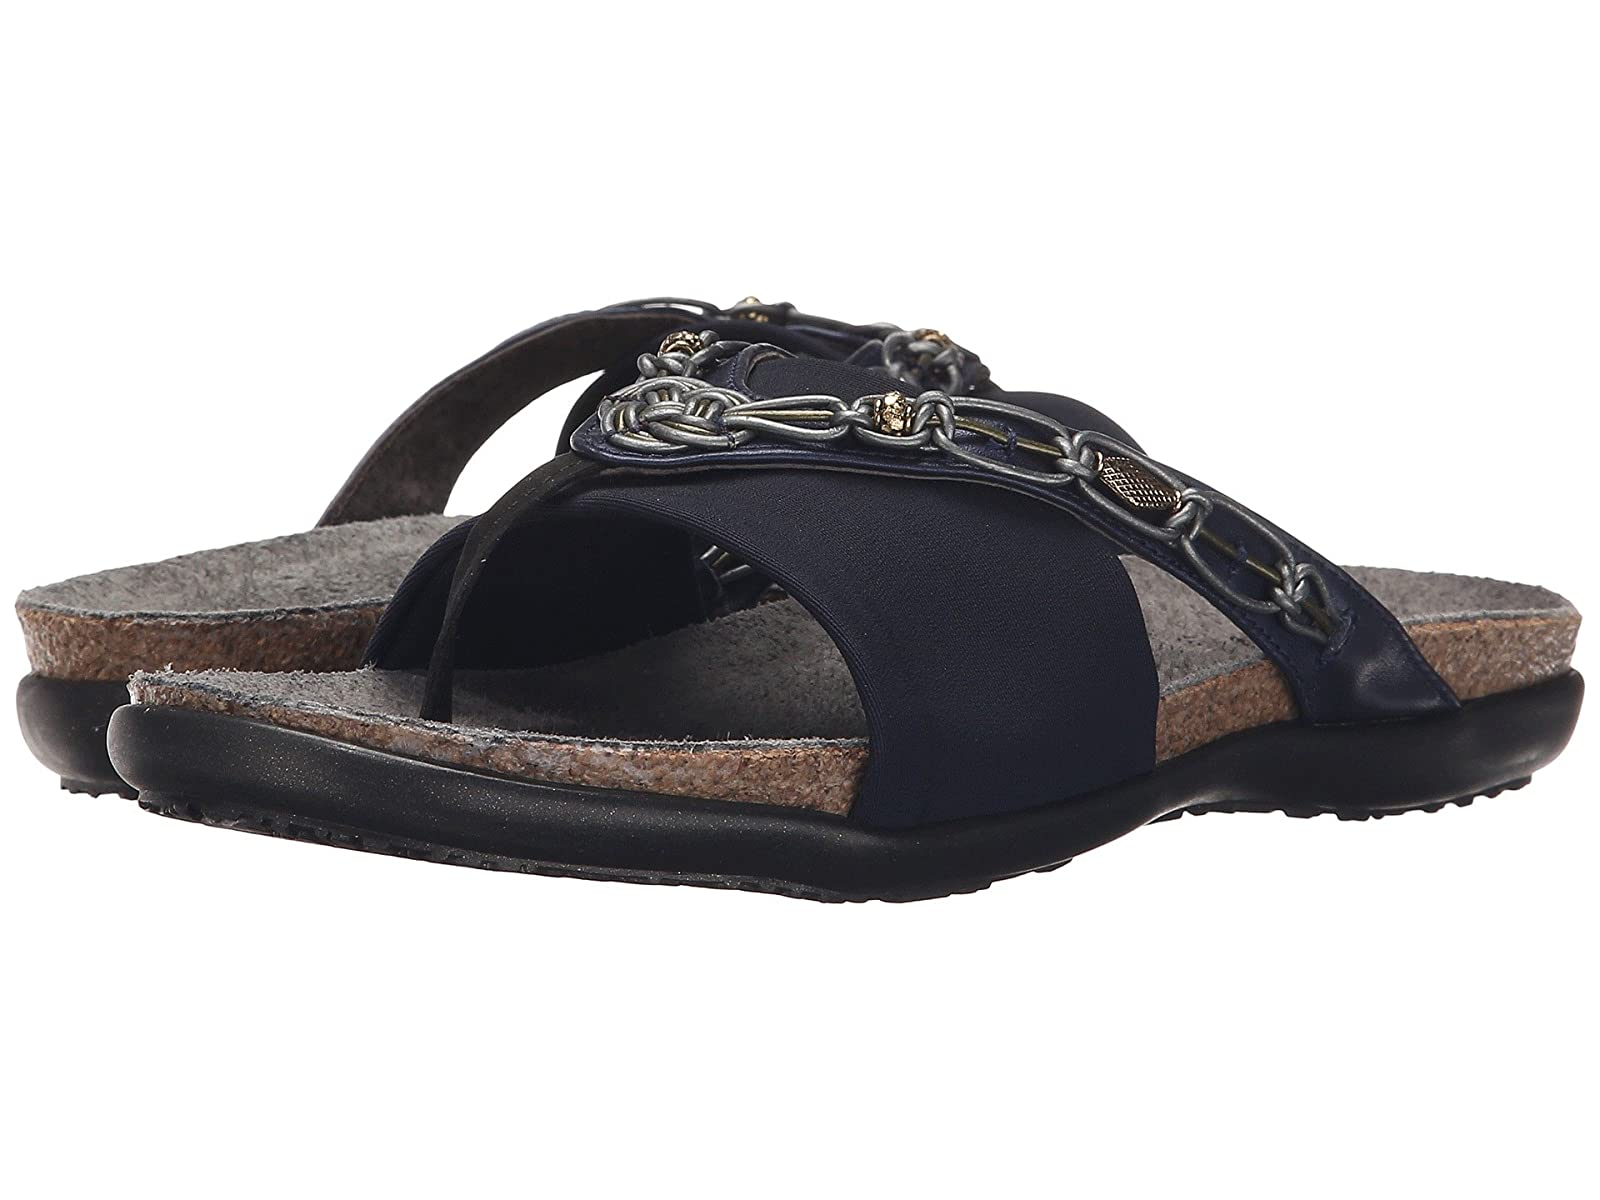 Naot JenniferAtmospheric grades have affordable shoes